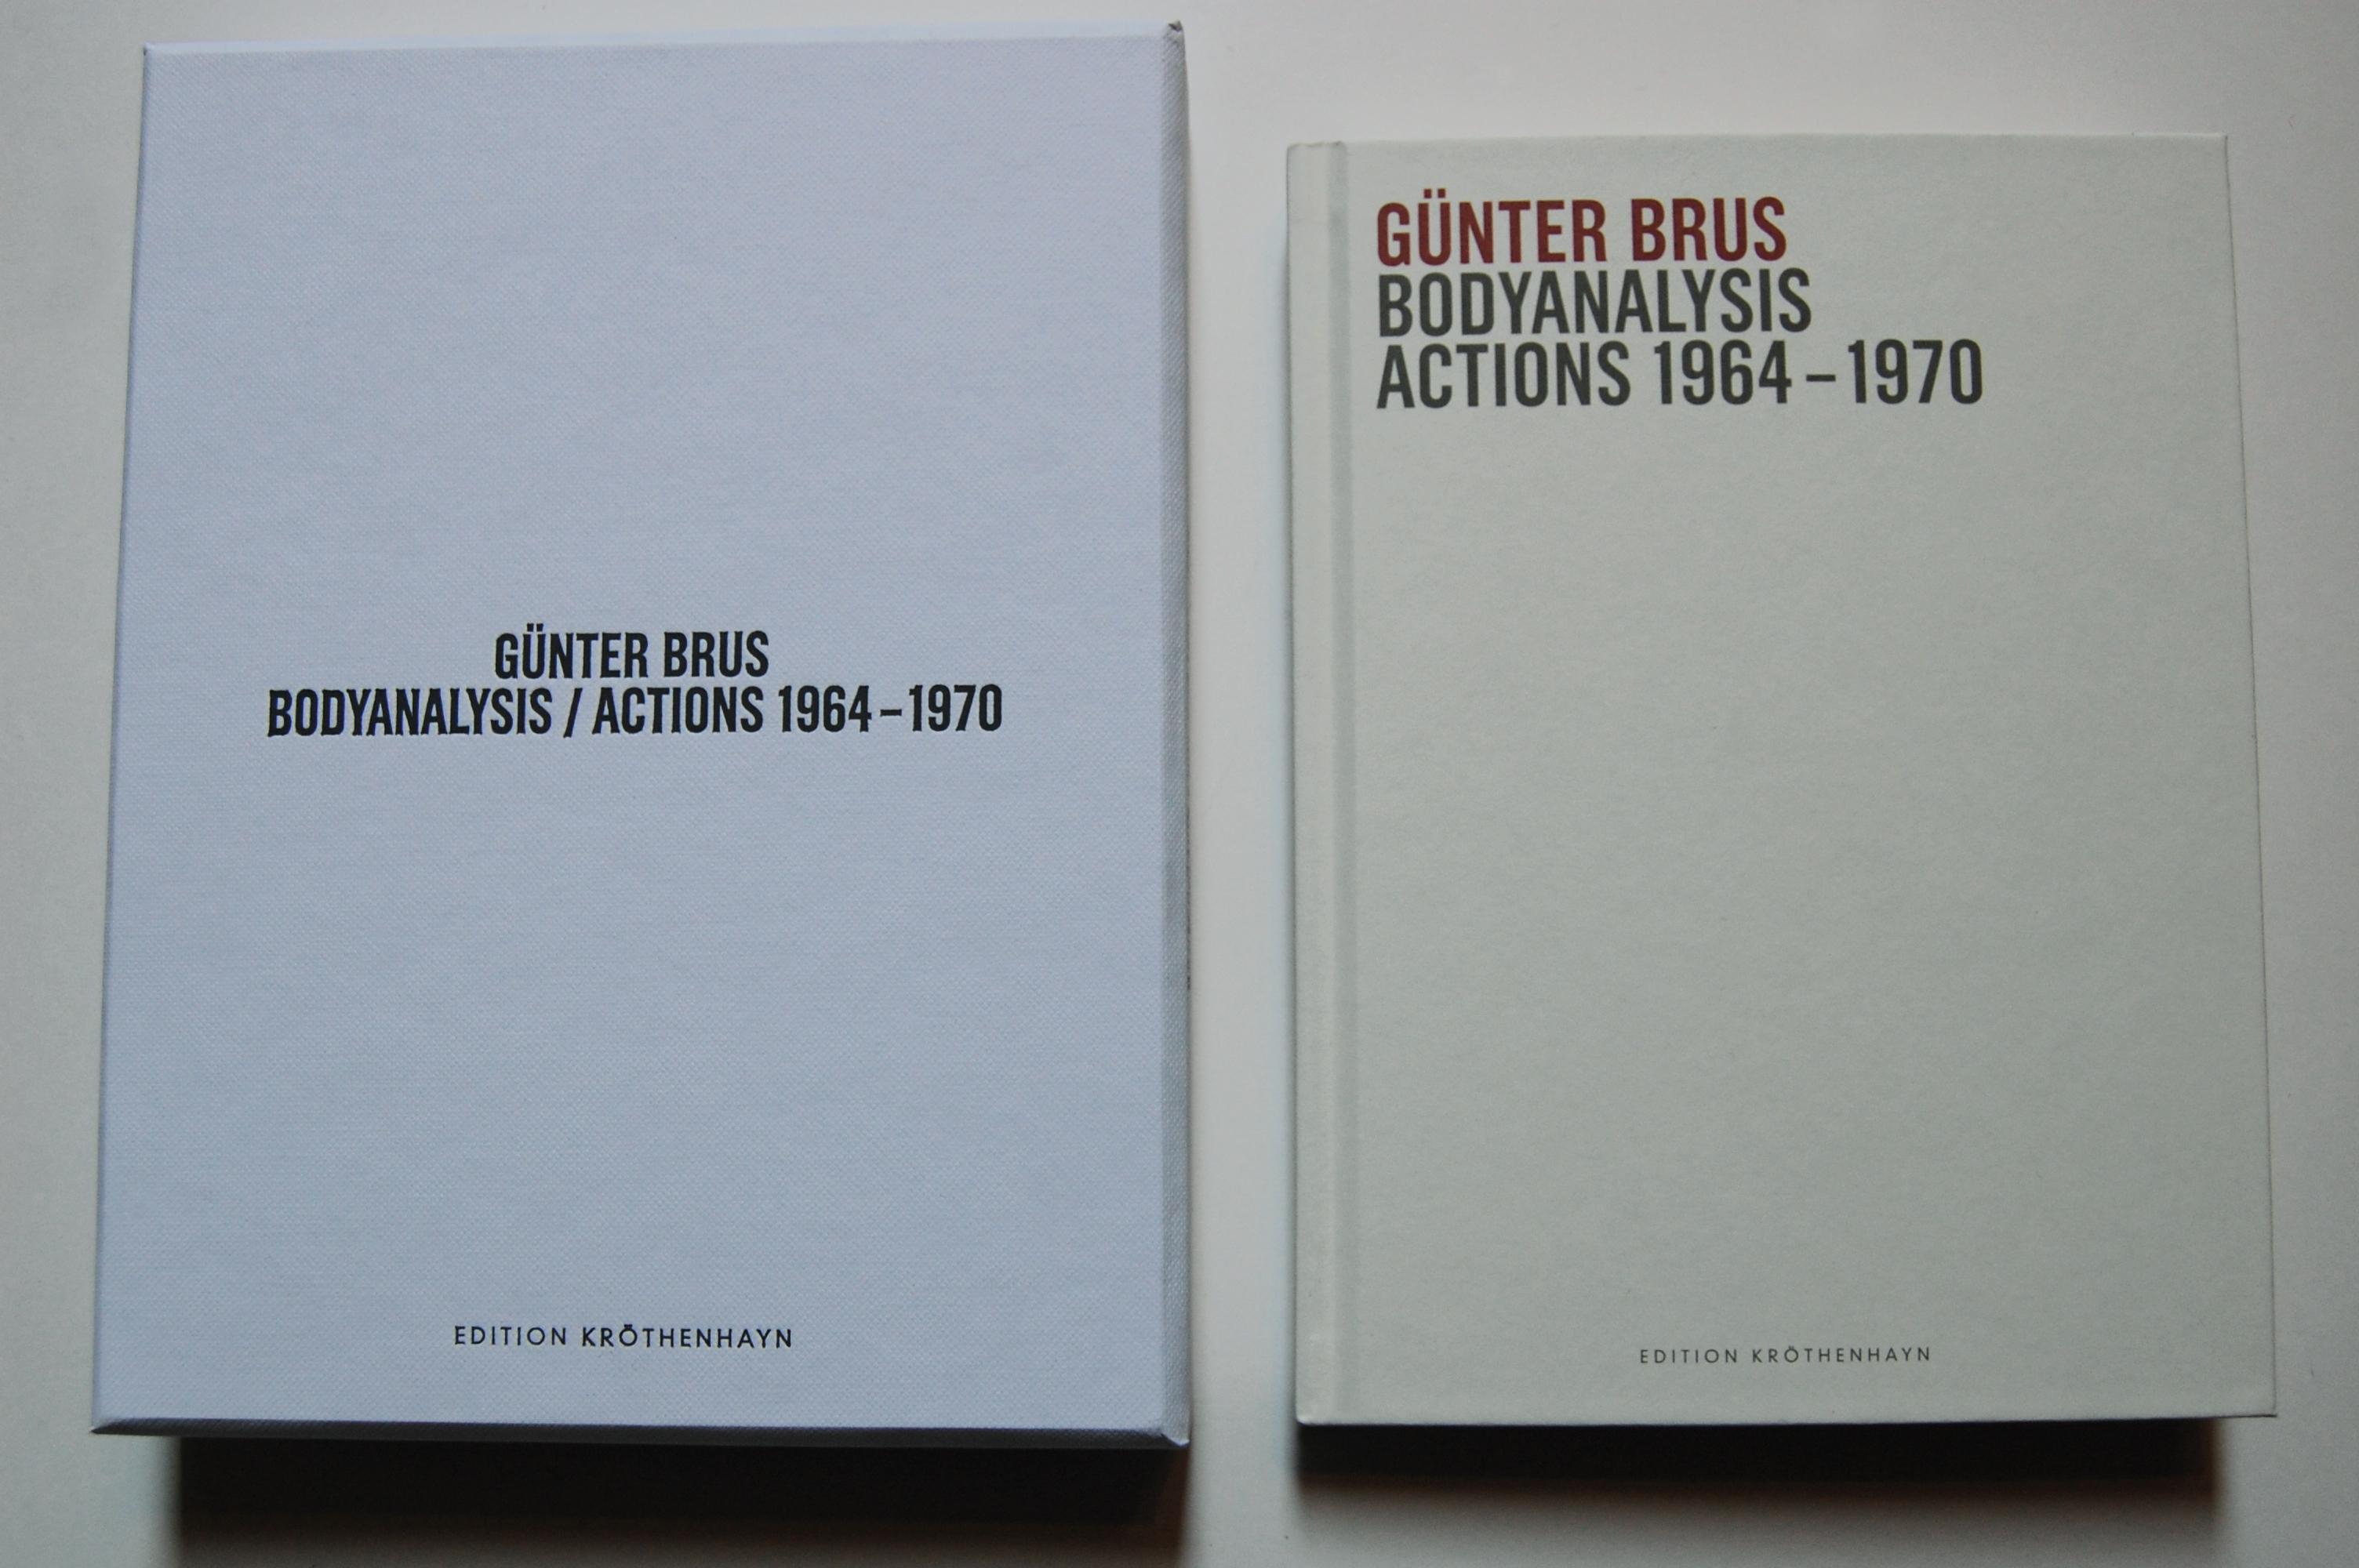 Günter Brus - Bodyanalysis/ Actions 1964-1970